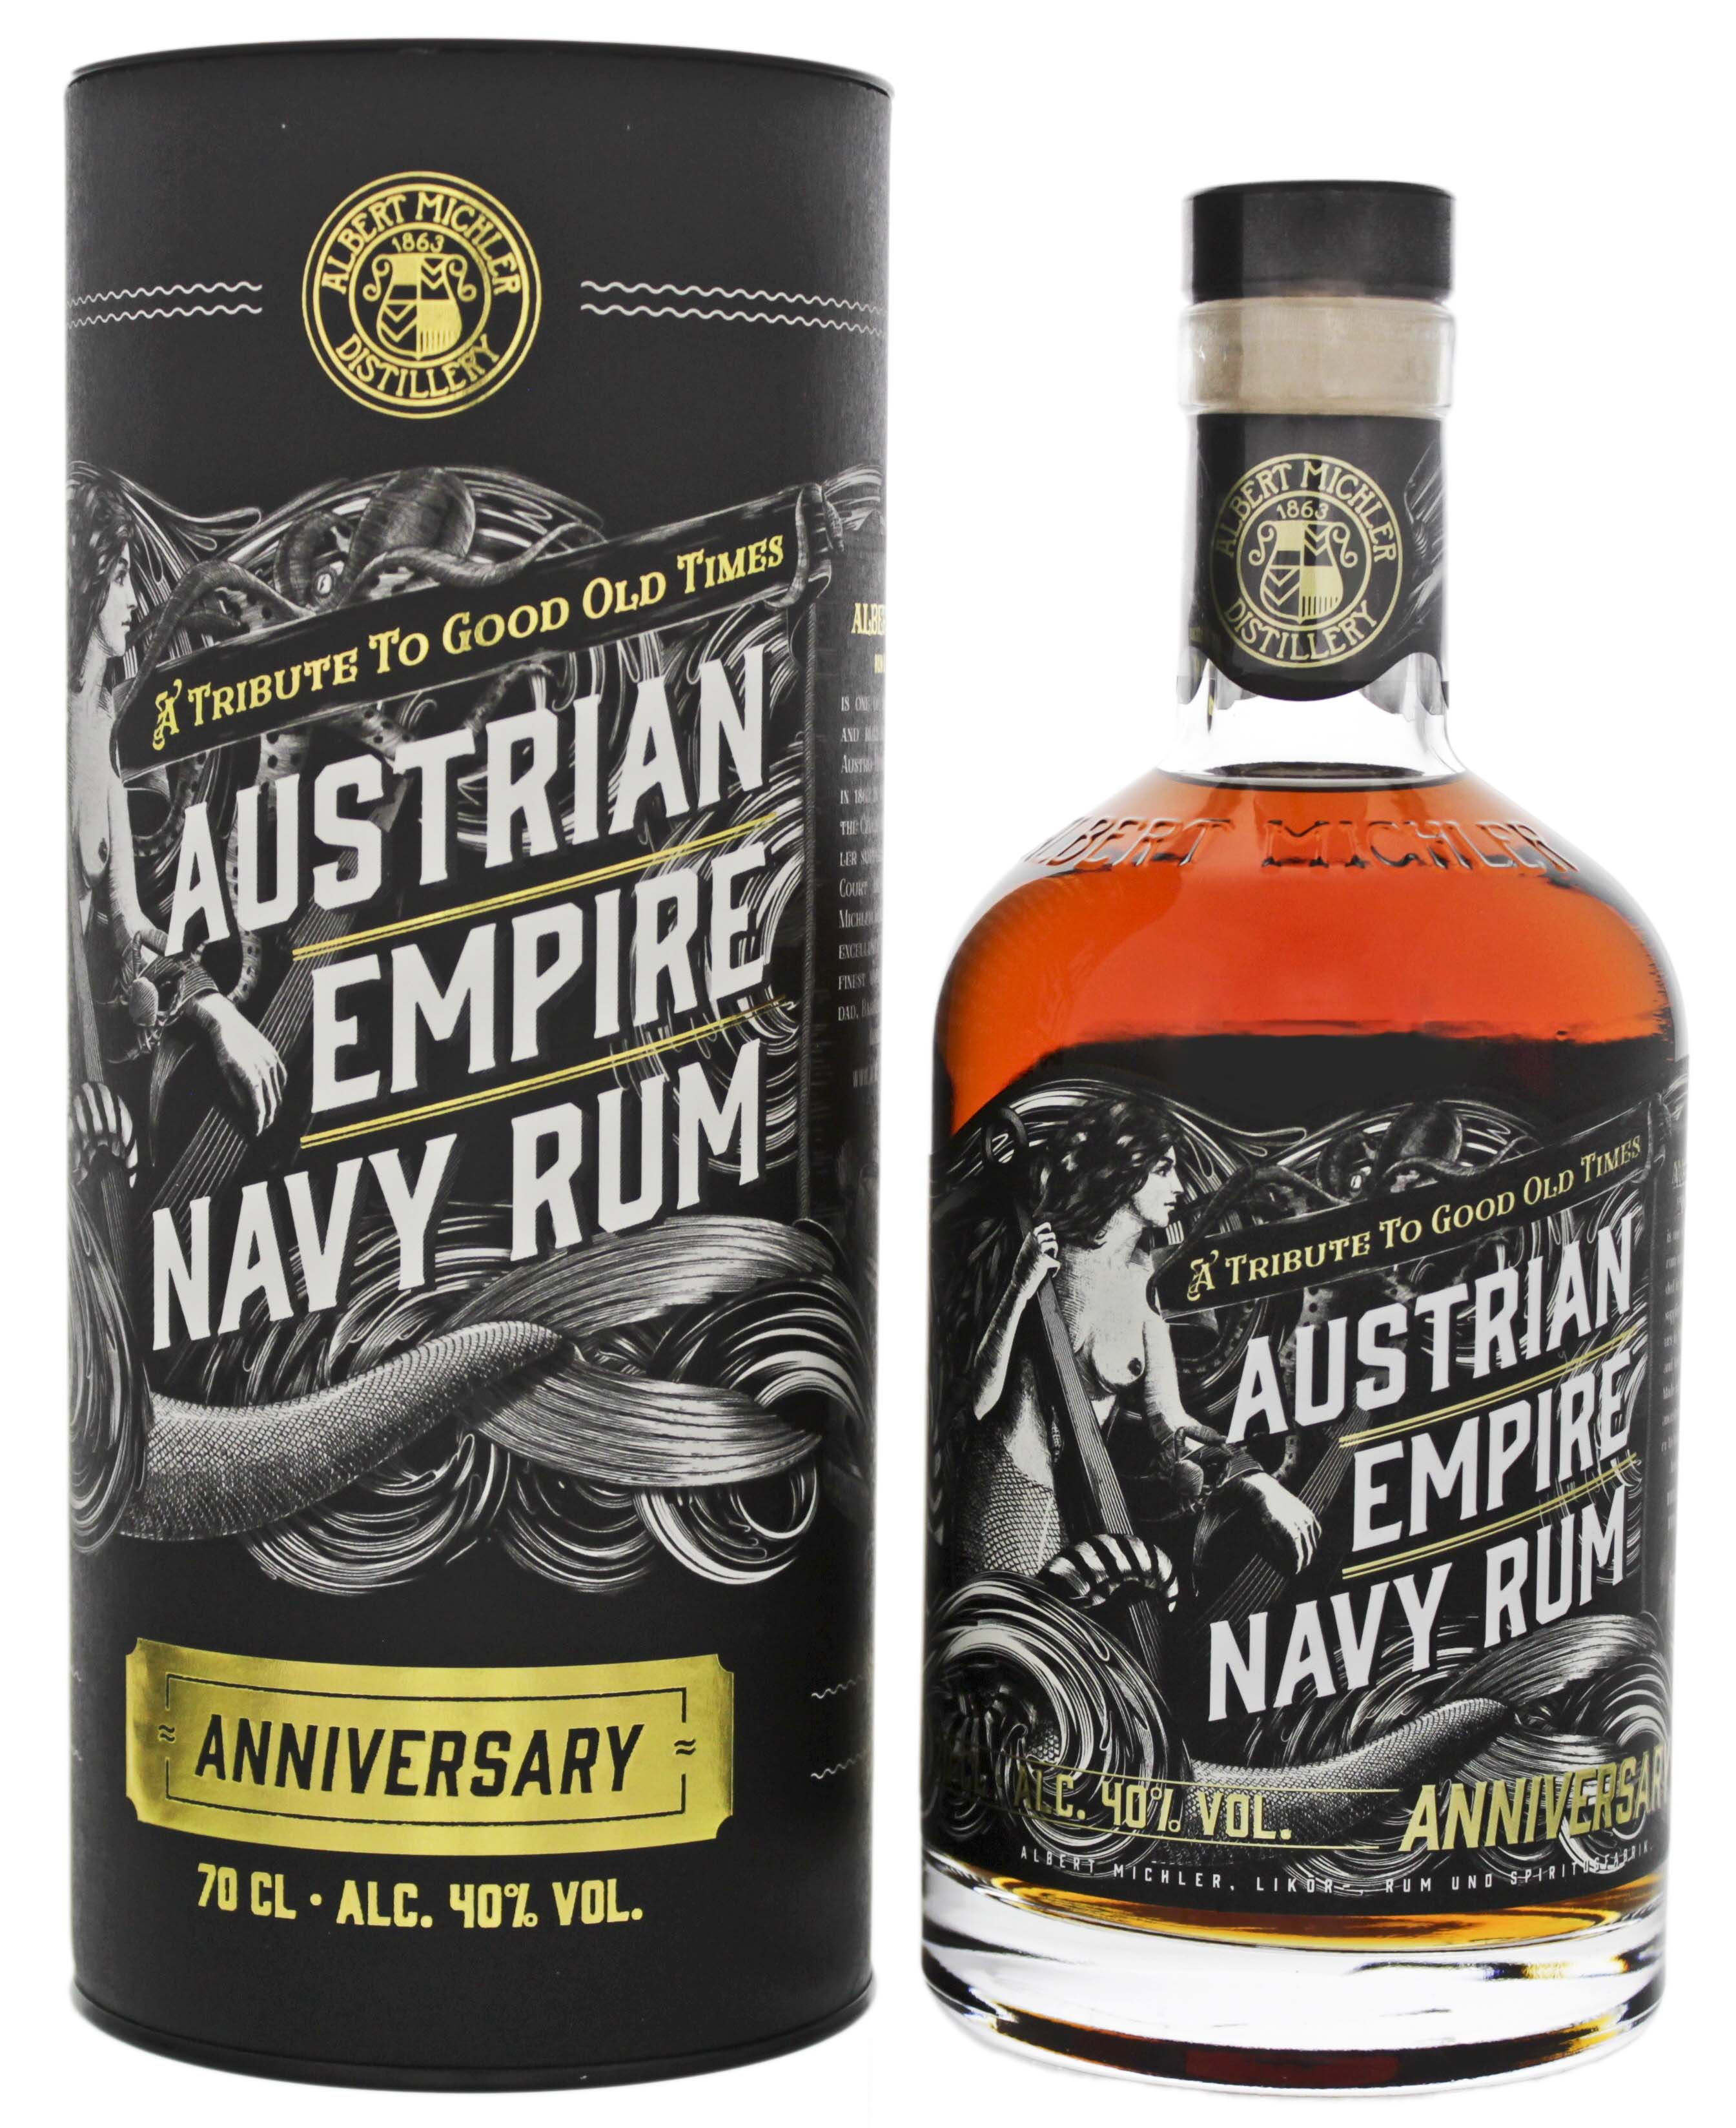 Austrian Empire Navy Rum Anniversary 0,7L